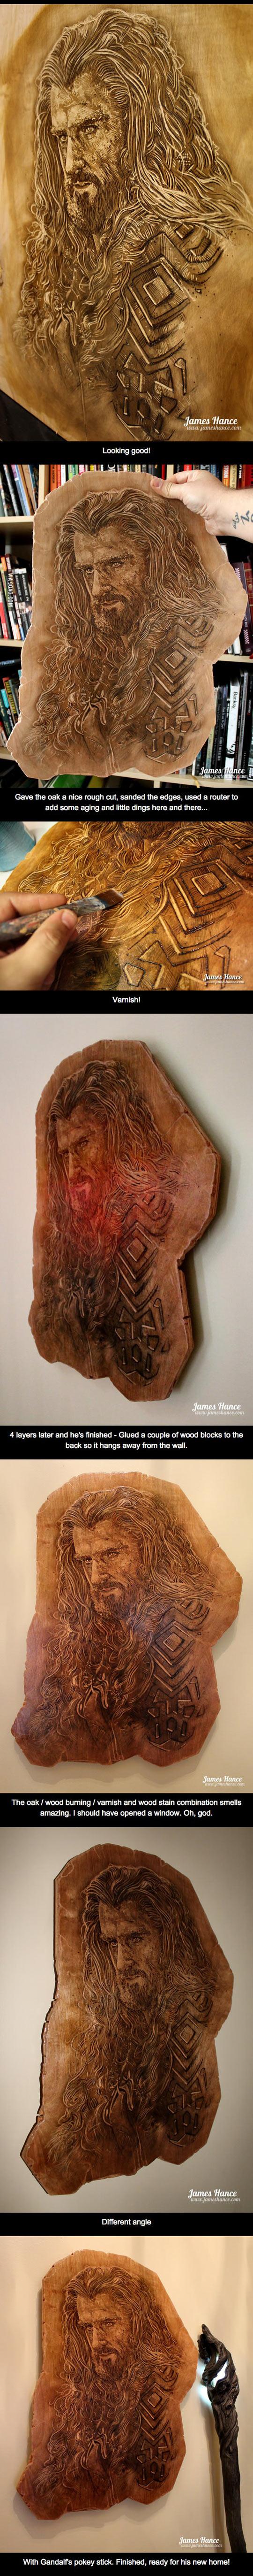 Thorin-Oakenshield-wood-carving-oak-art